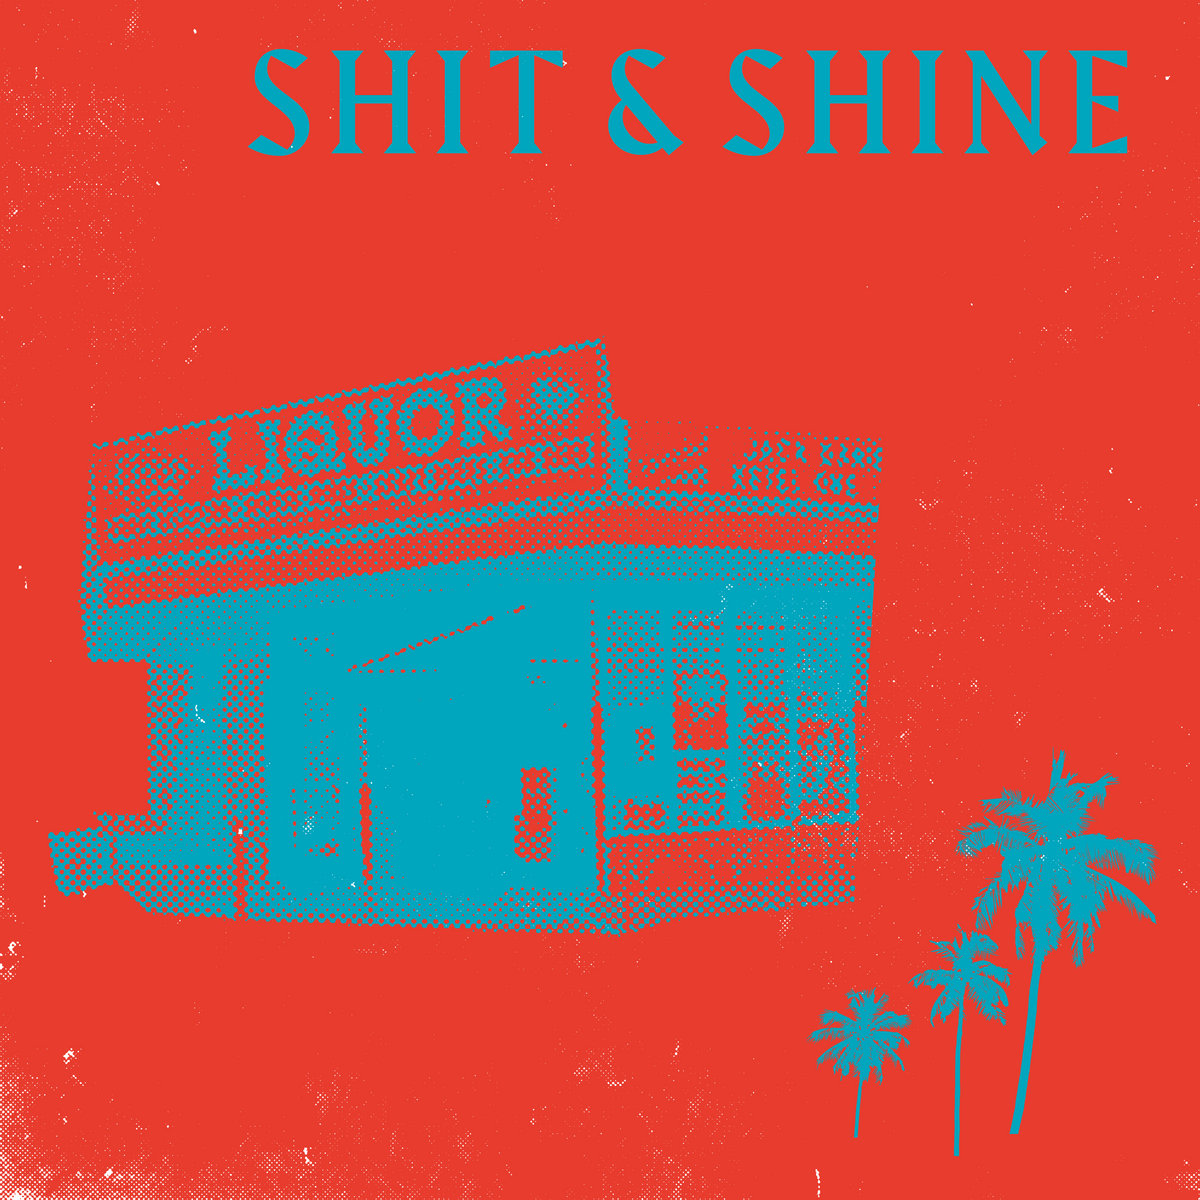 Shit and Shine - Malibu Liquor Store